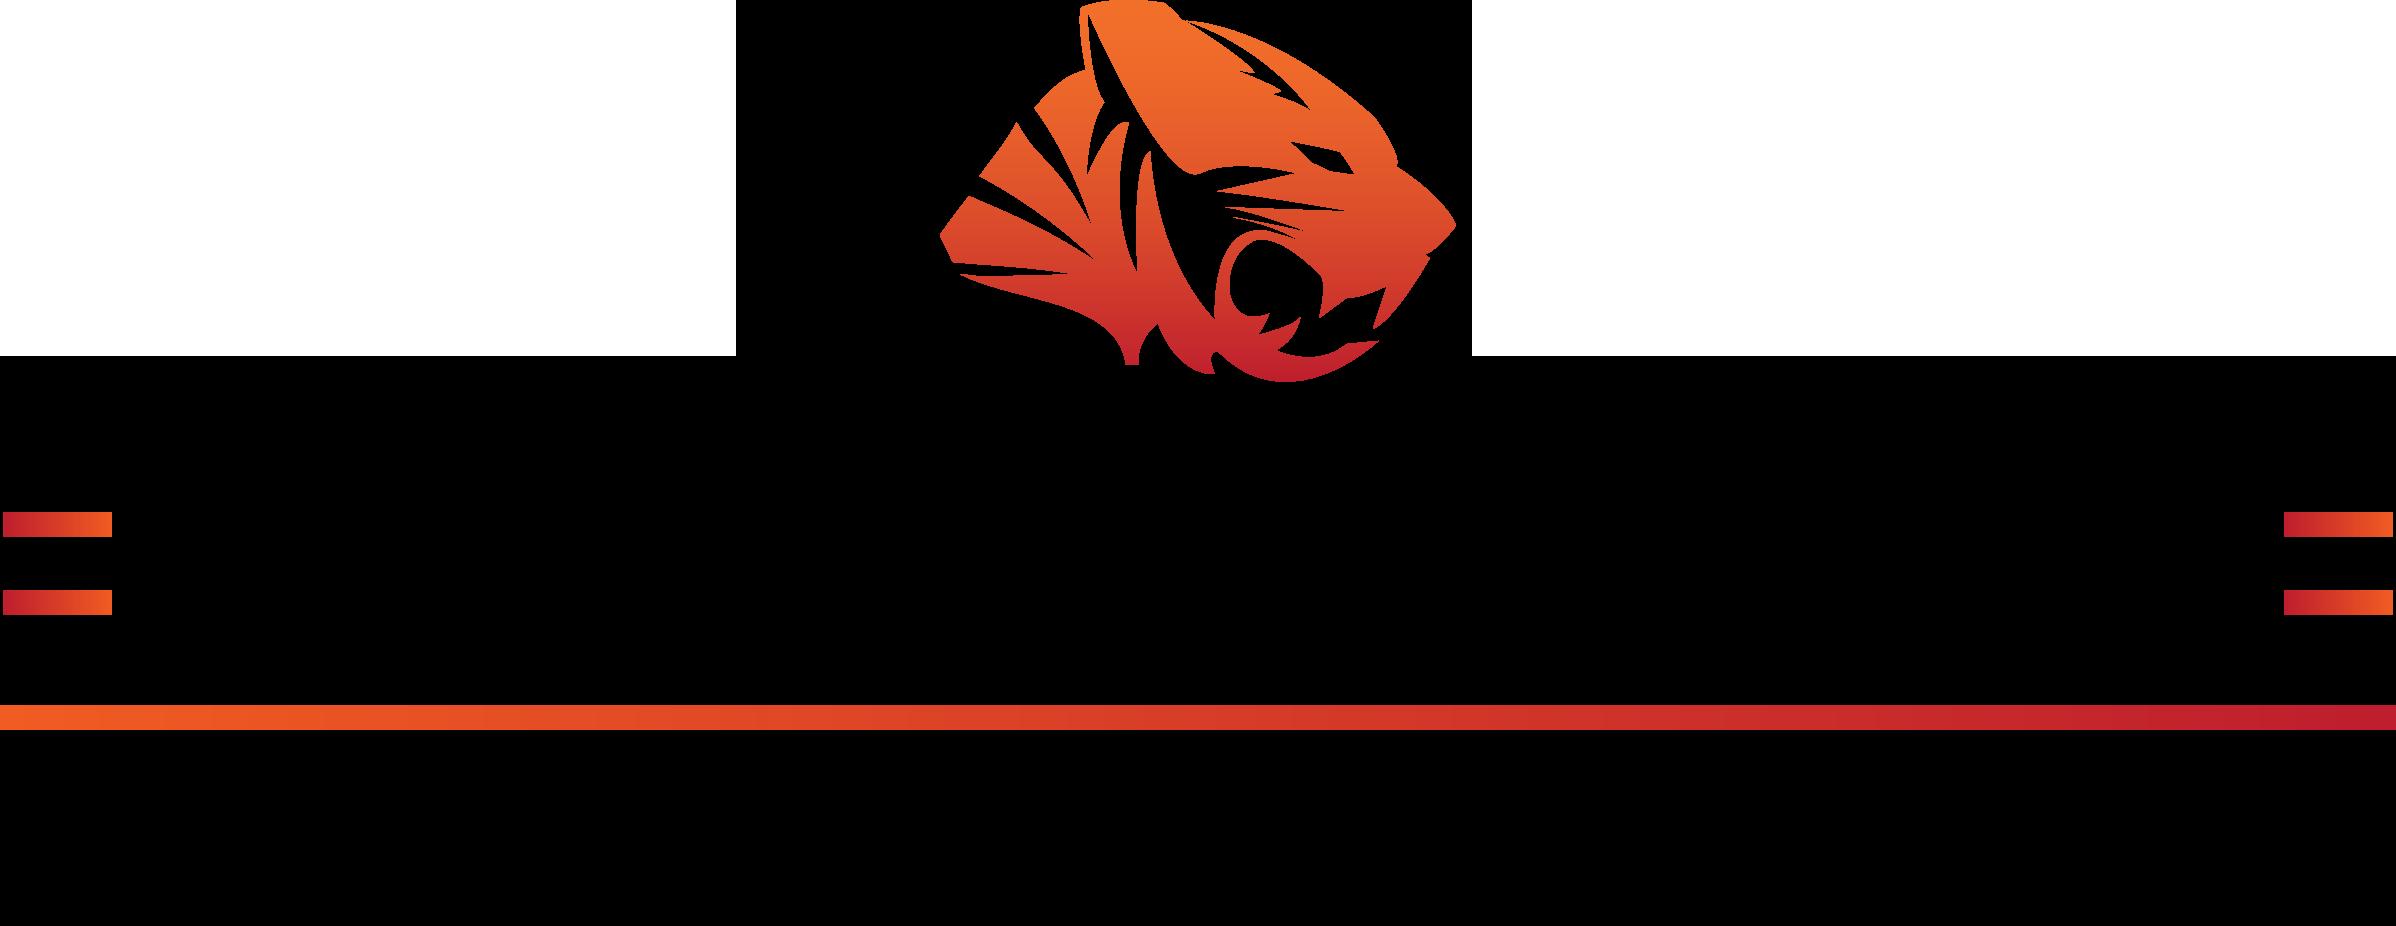 CGT TIGA Awards 2019 Finalist Logo PNG